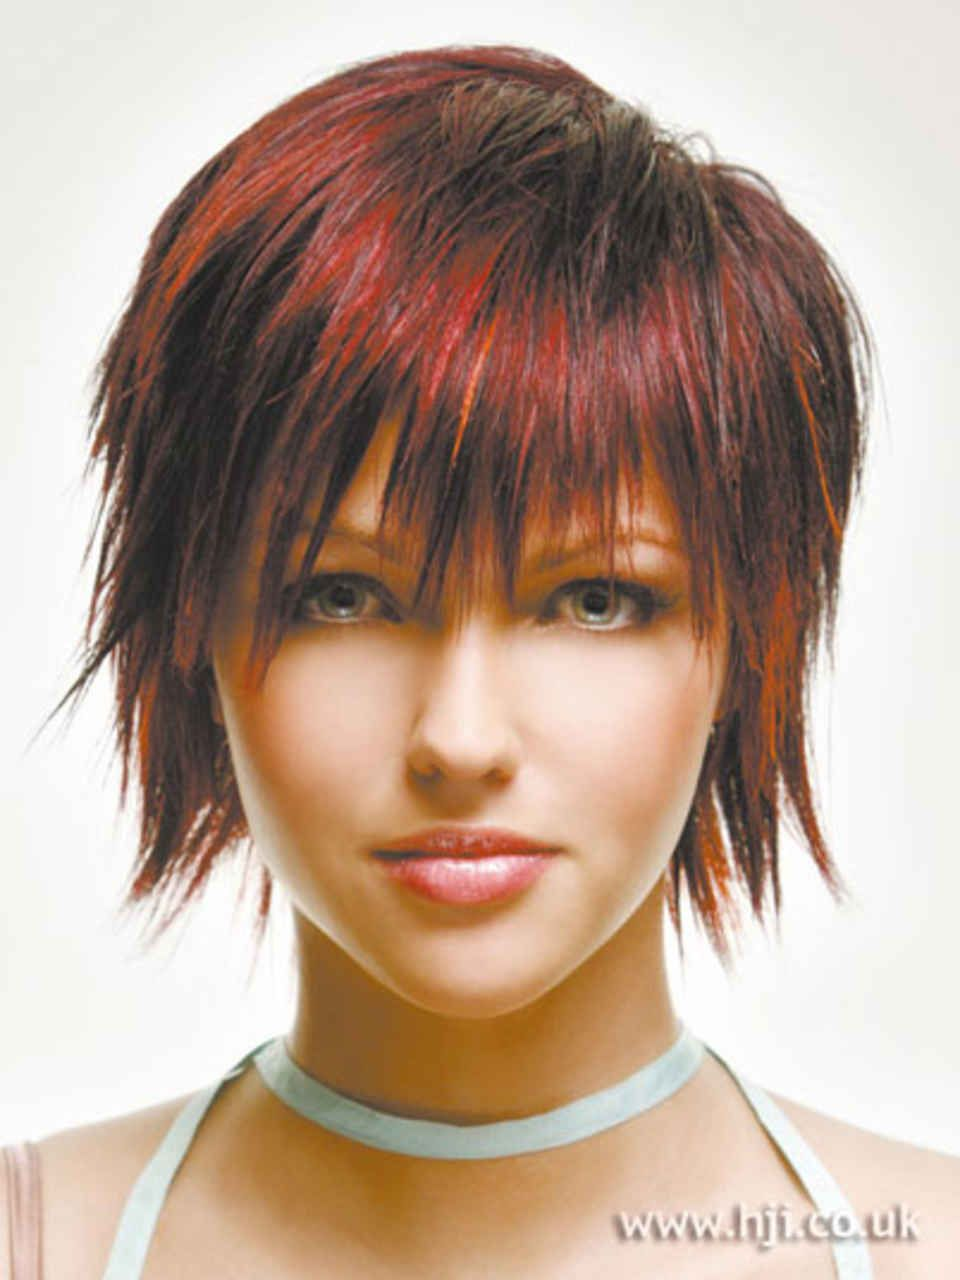 How To Grow Out A Layered Haircut Choppy Hair Medium Hair Styles Short Layered Bob Hairstyles